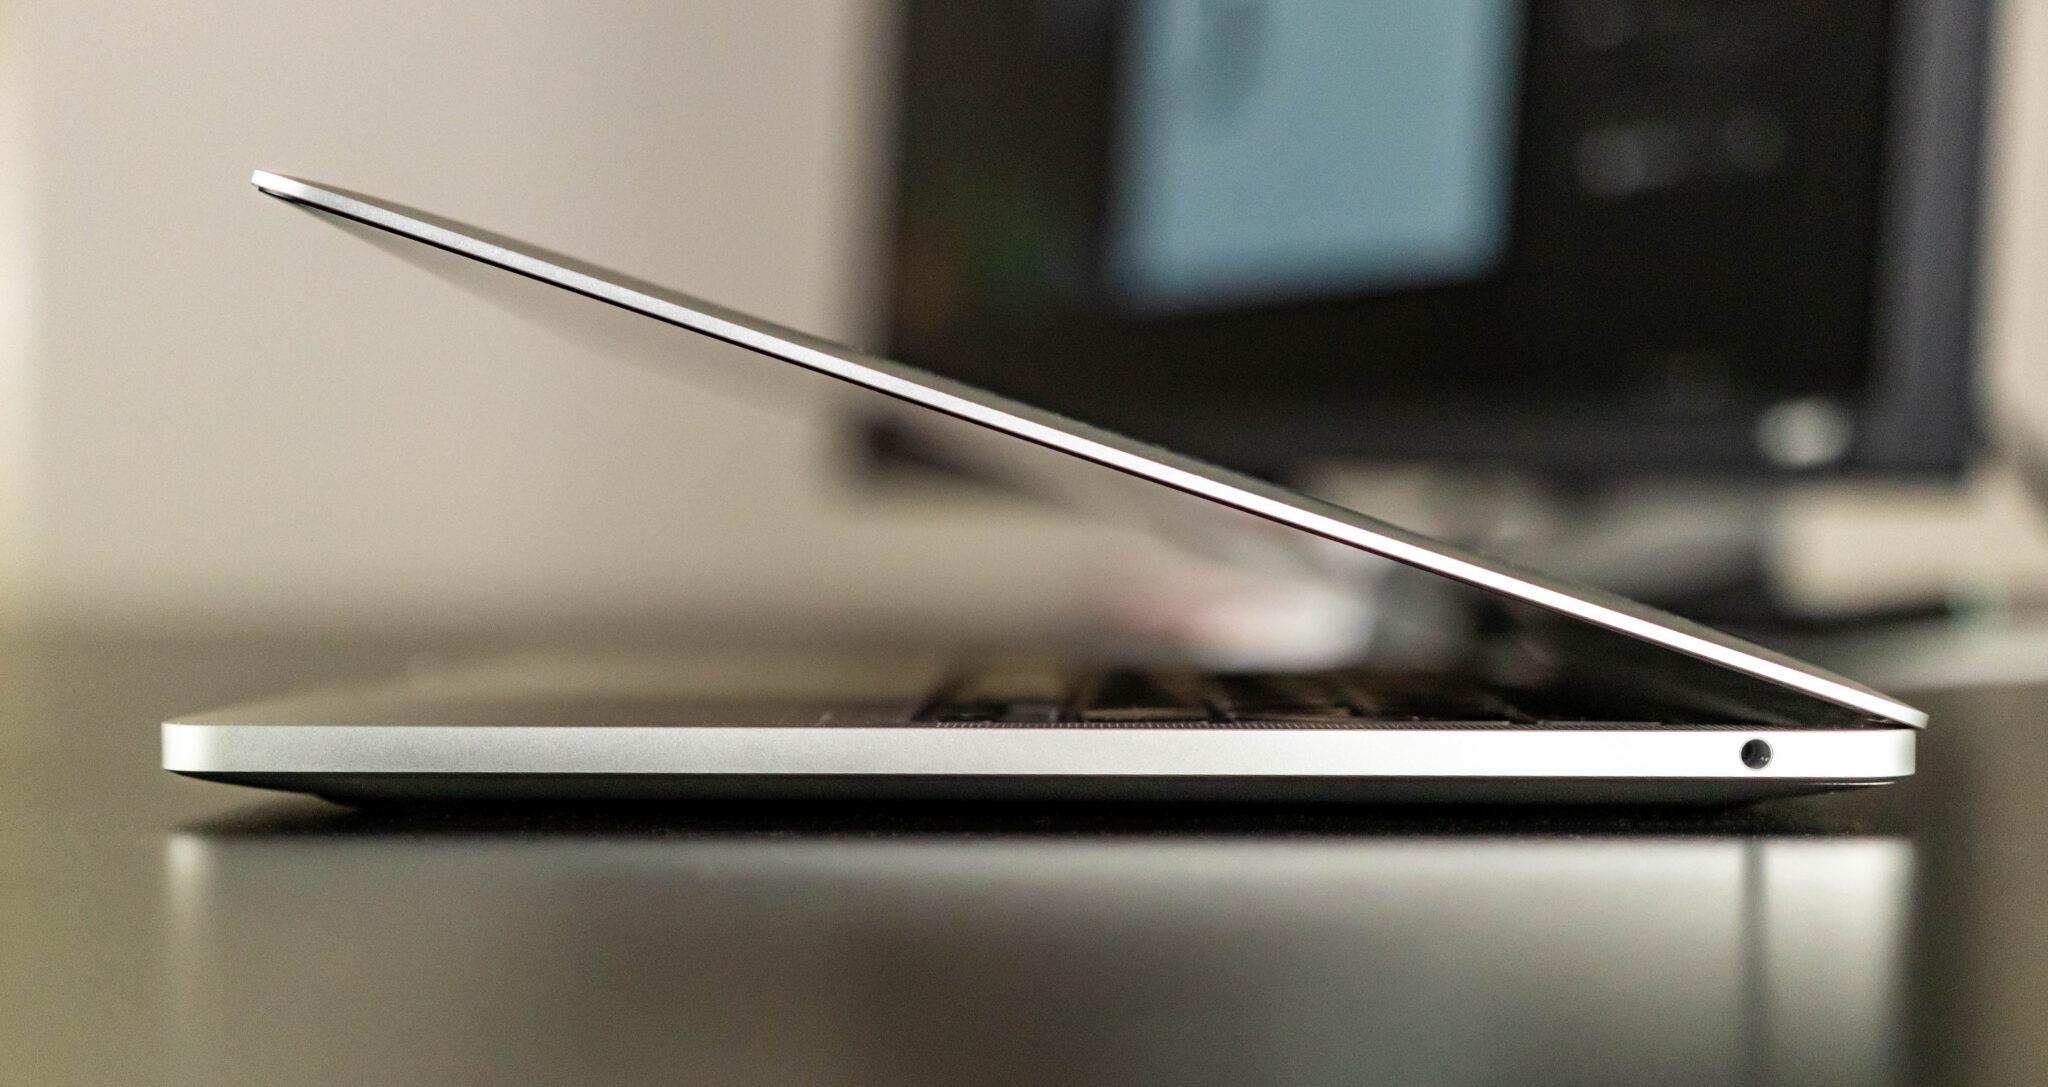 Apple MacBook Pro M1-Klinkenanschluss